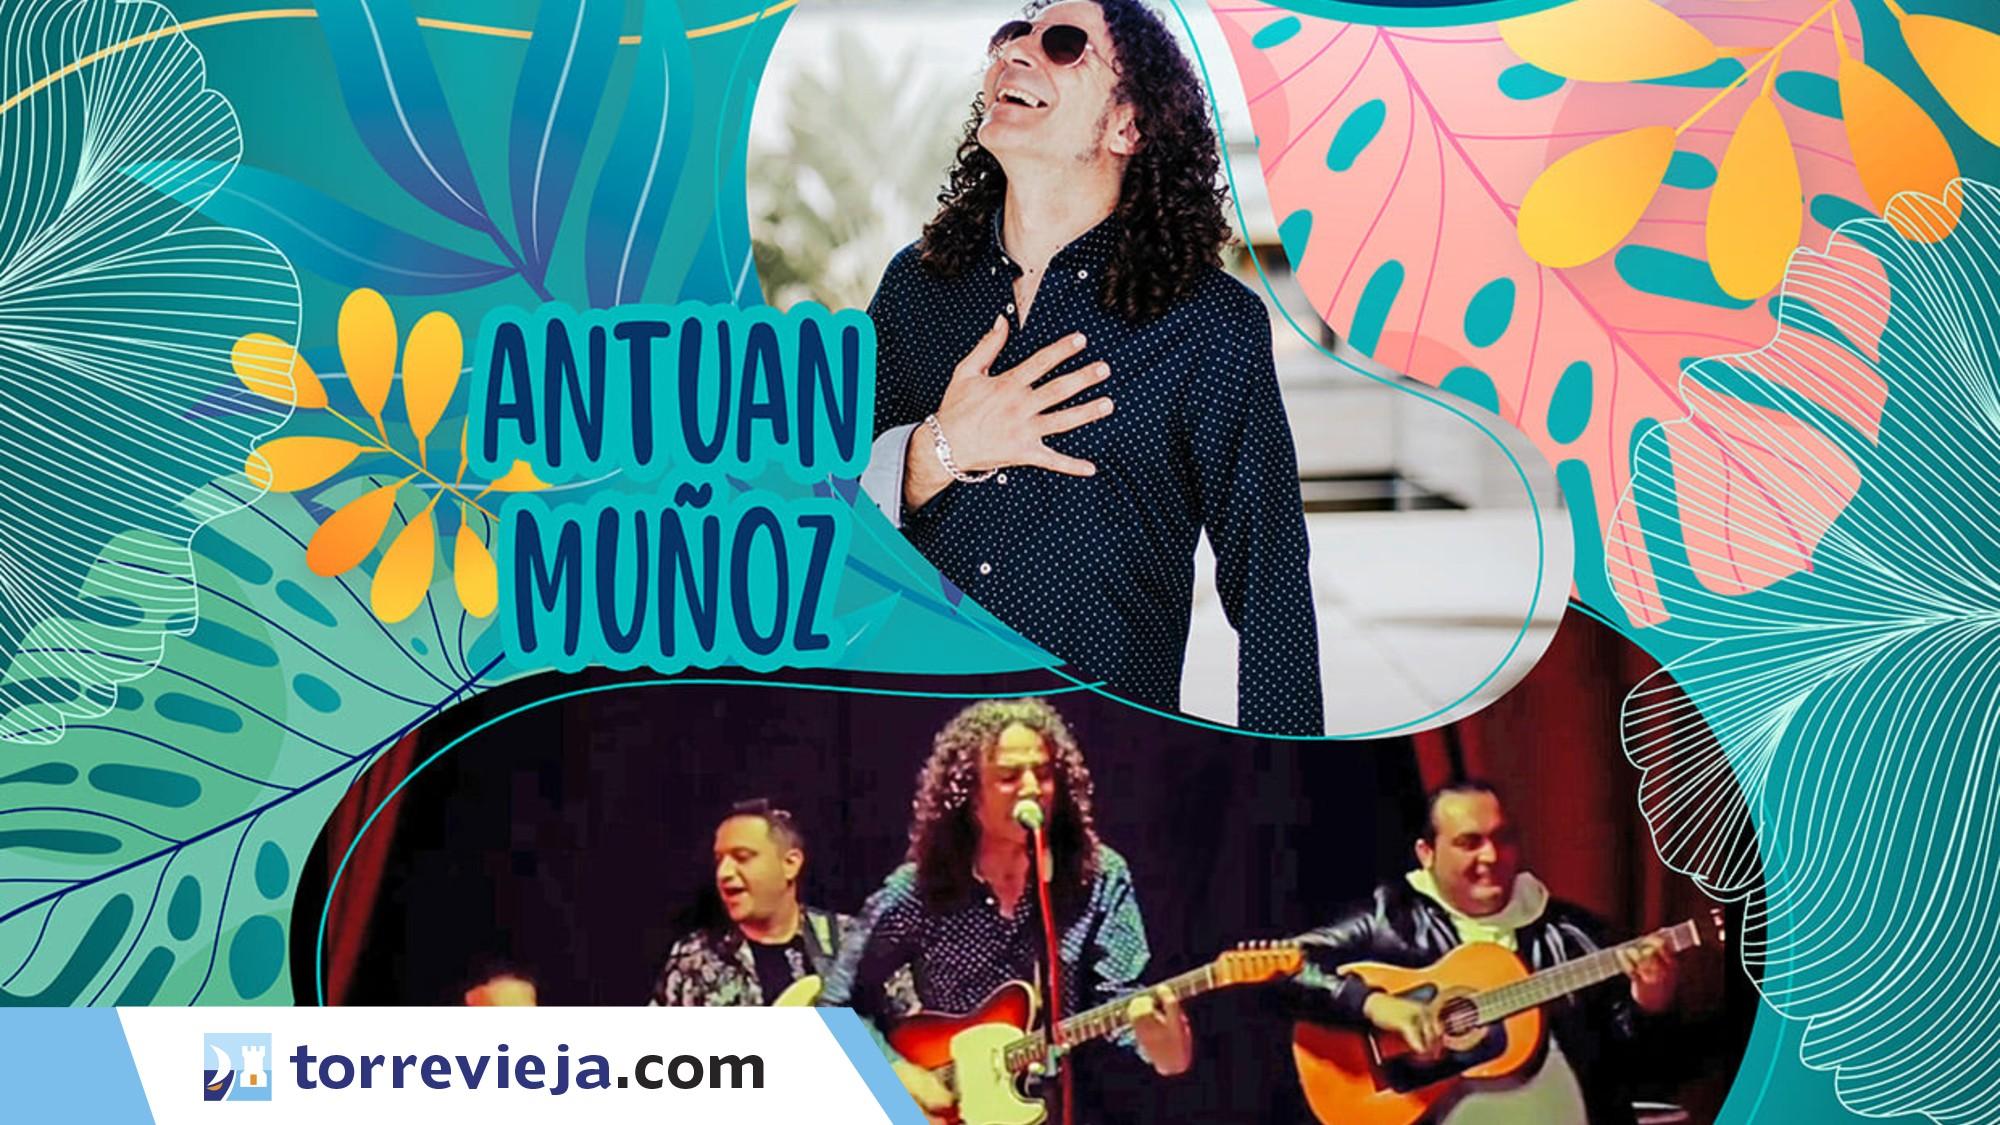 concierto flamenco Antuan Muñoz Orihuela Costa Torreviejacom agosto2021